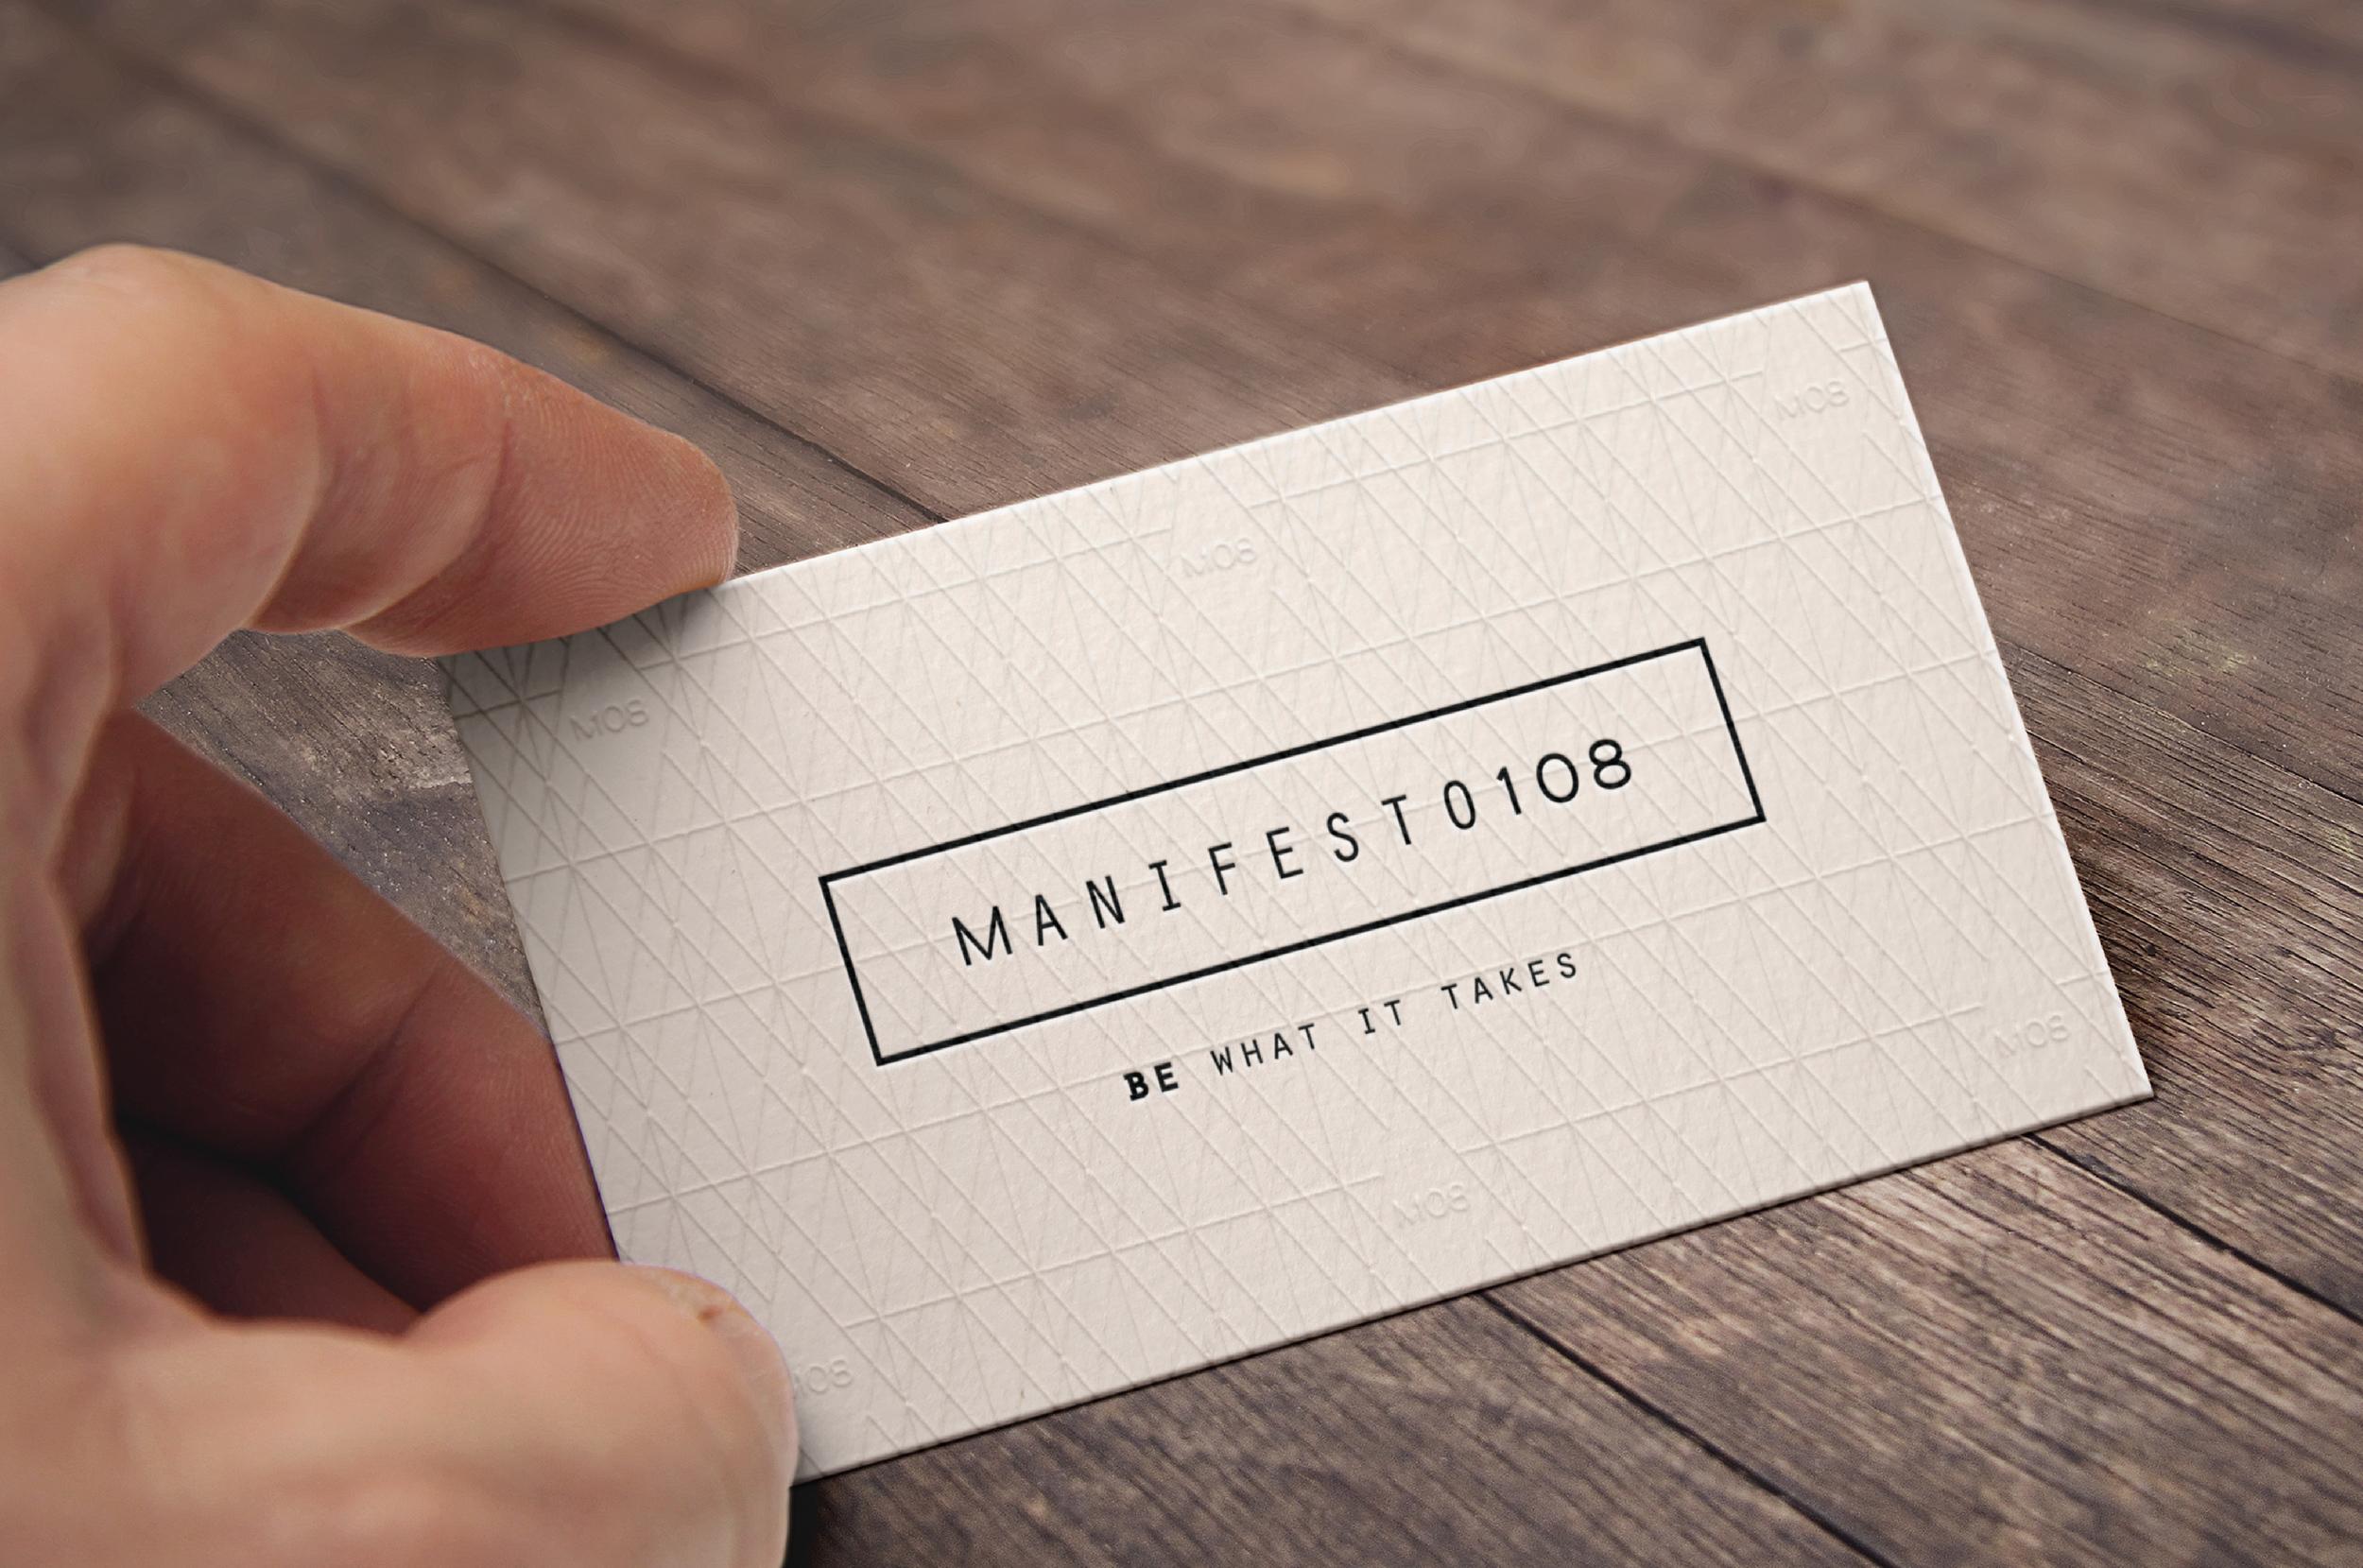 manifesto-108-personal-training-business-cards-design